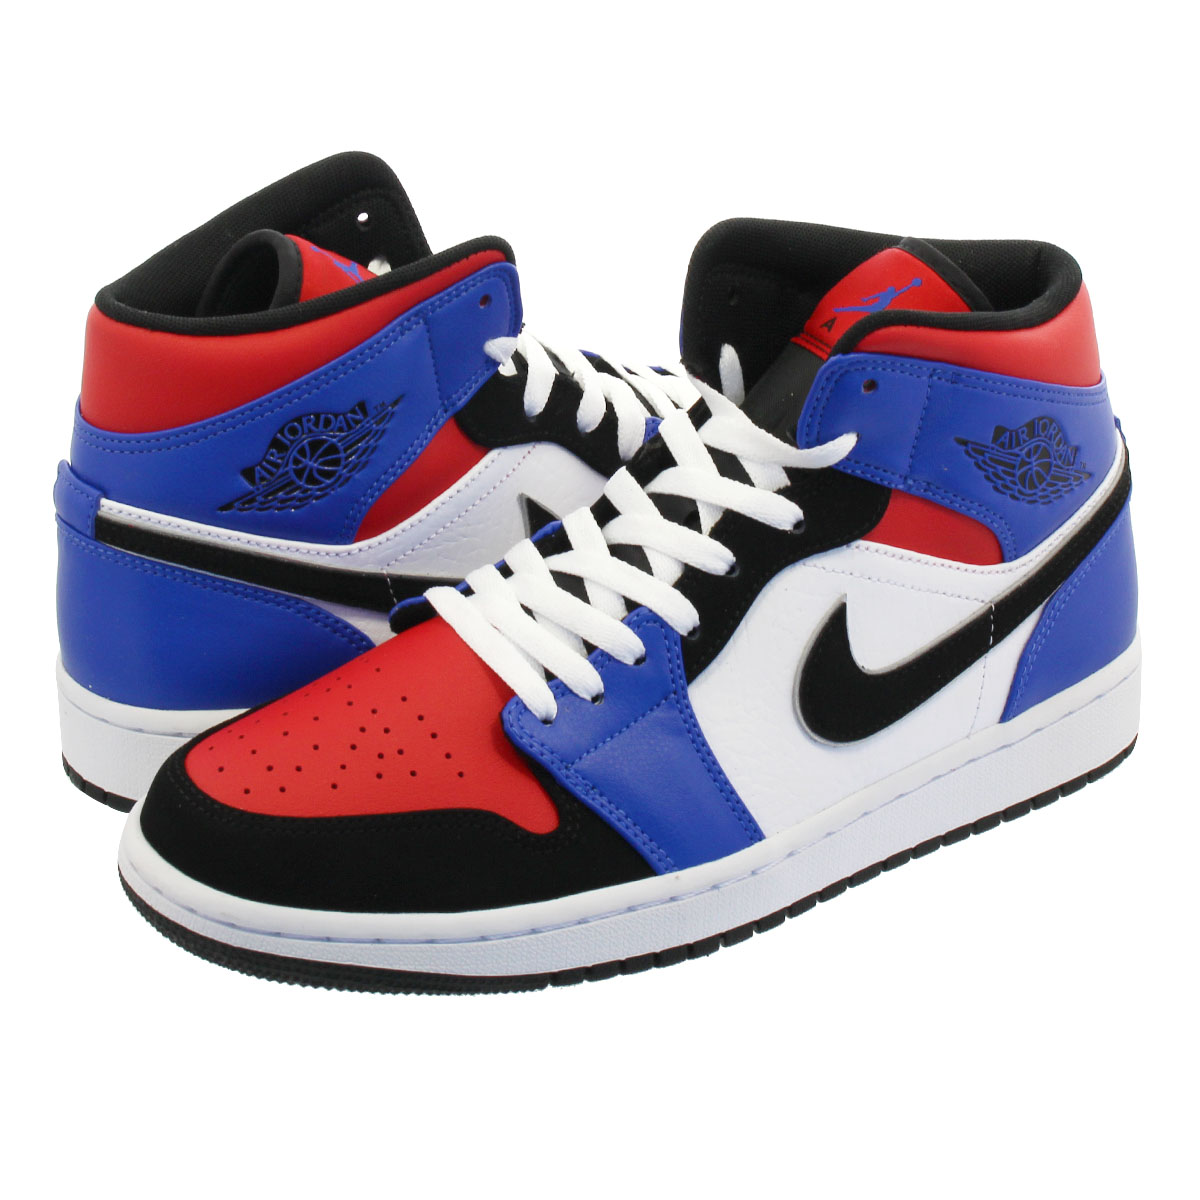 5438046b2c21fb NIKE AIR JORDAN 1 MID Nike Air Jordan 1 mid WHITE BLACK HYPER ROYAL UNIVERSITY  RED 554